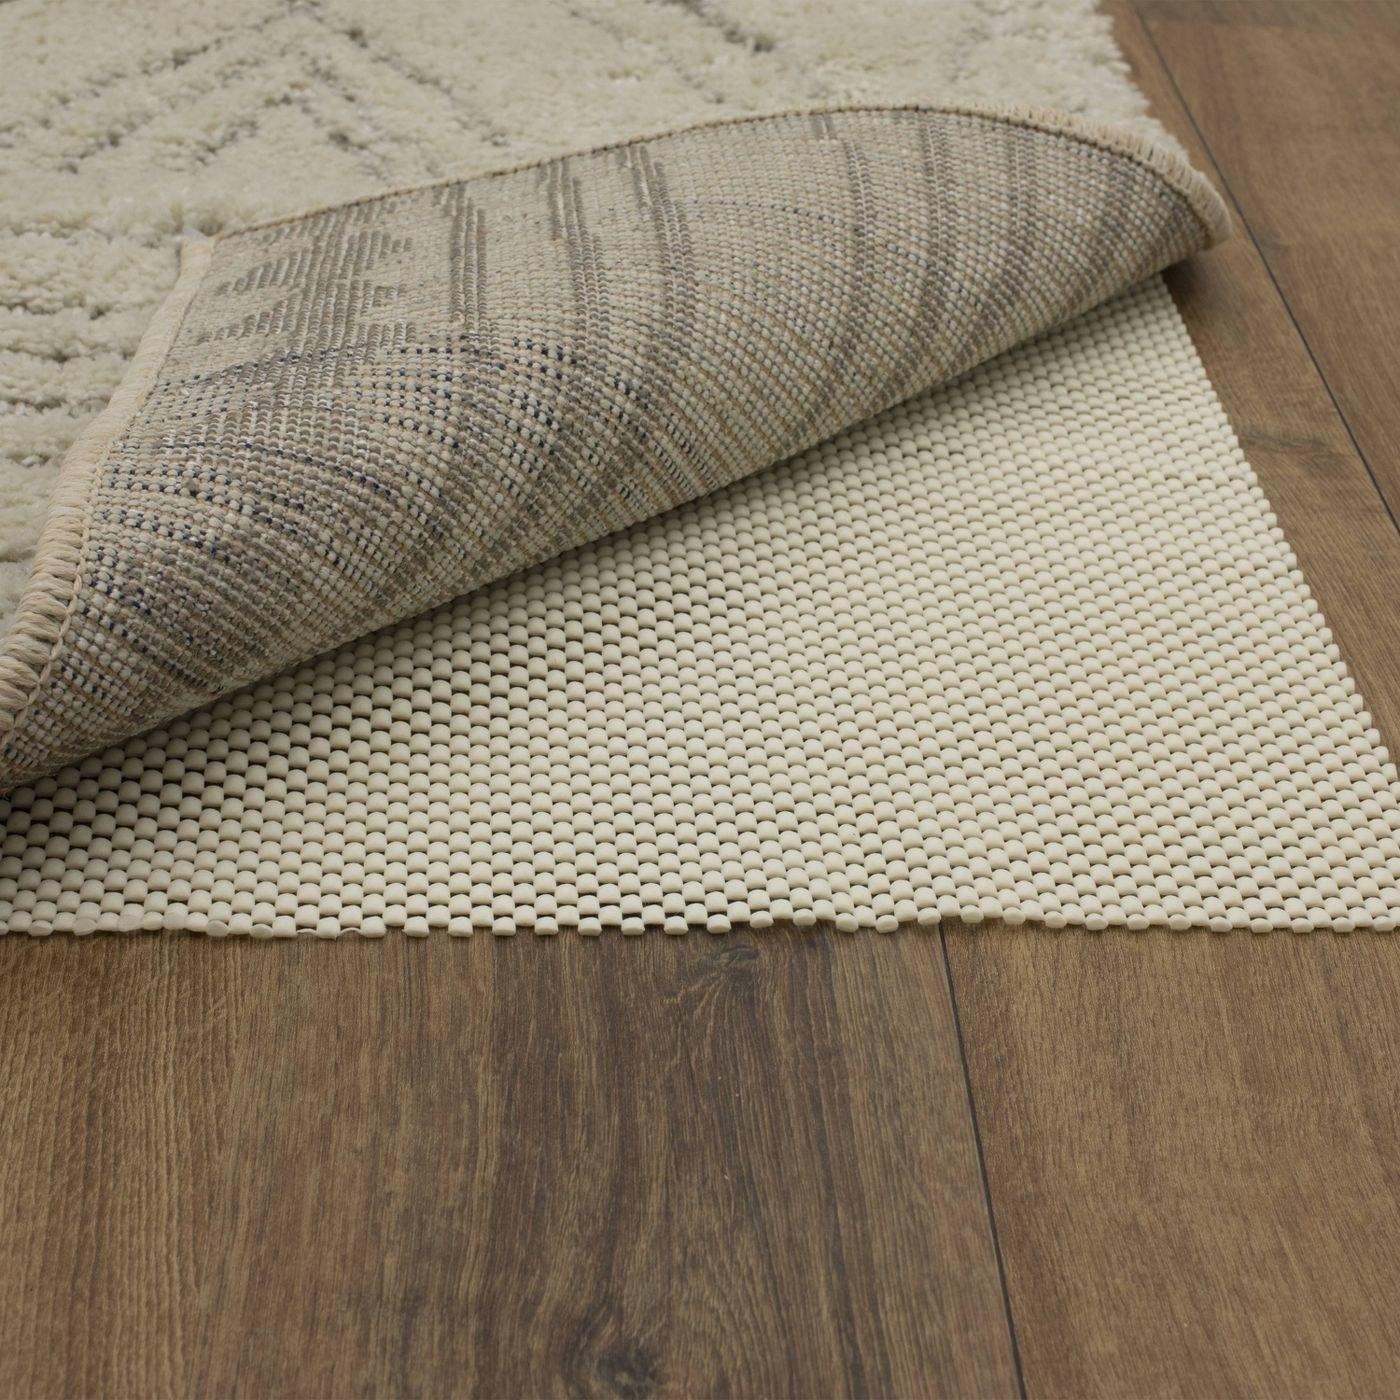 gripping rug pad underneath an area rug